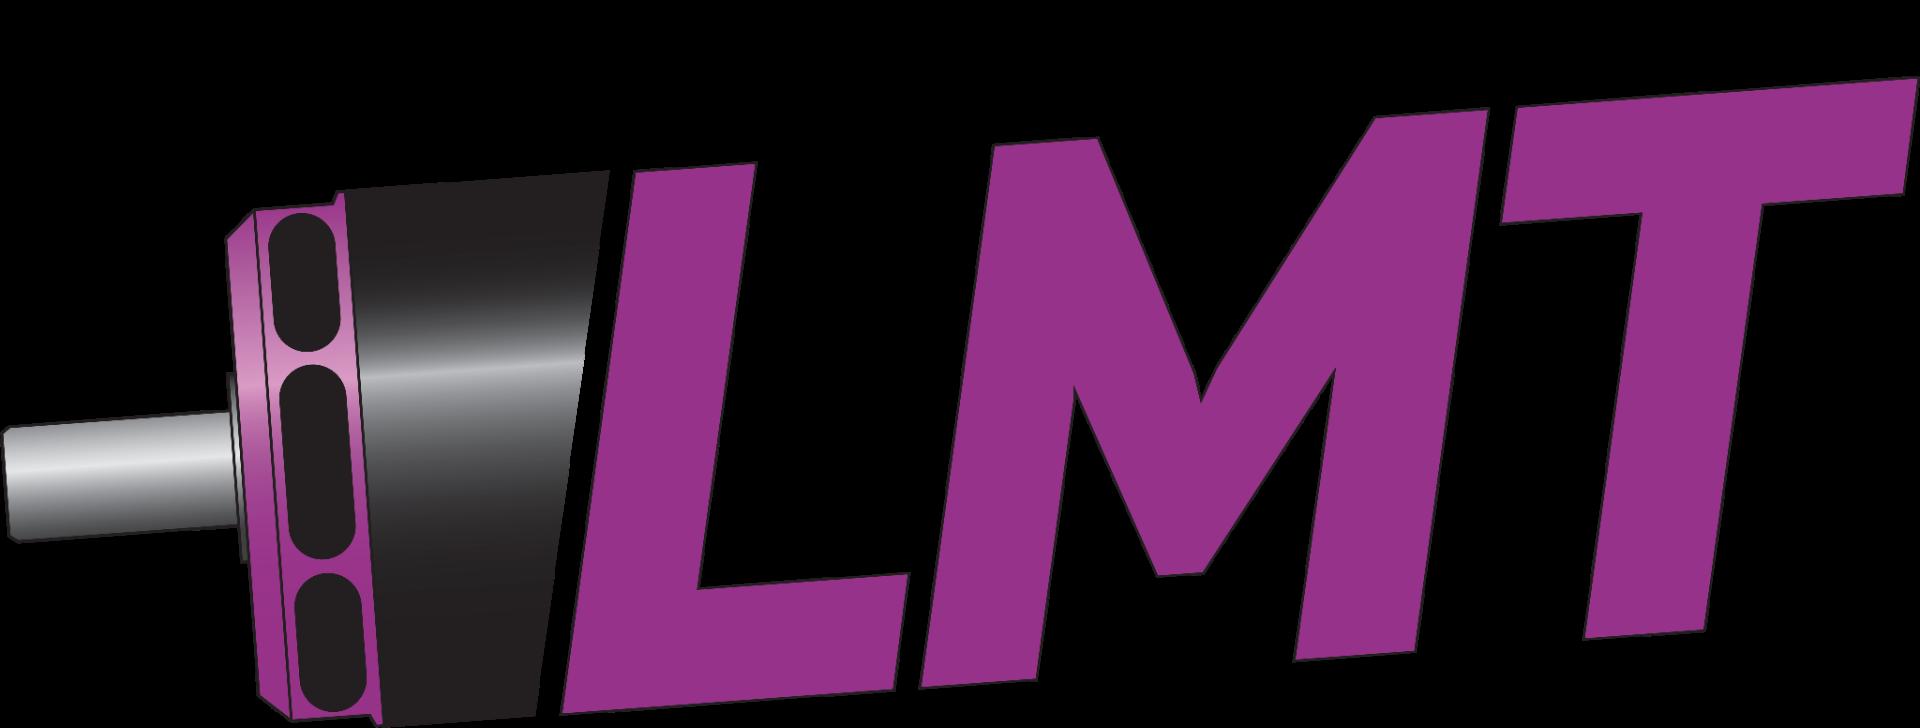 X-serie Lite logo